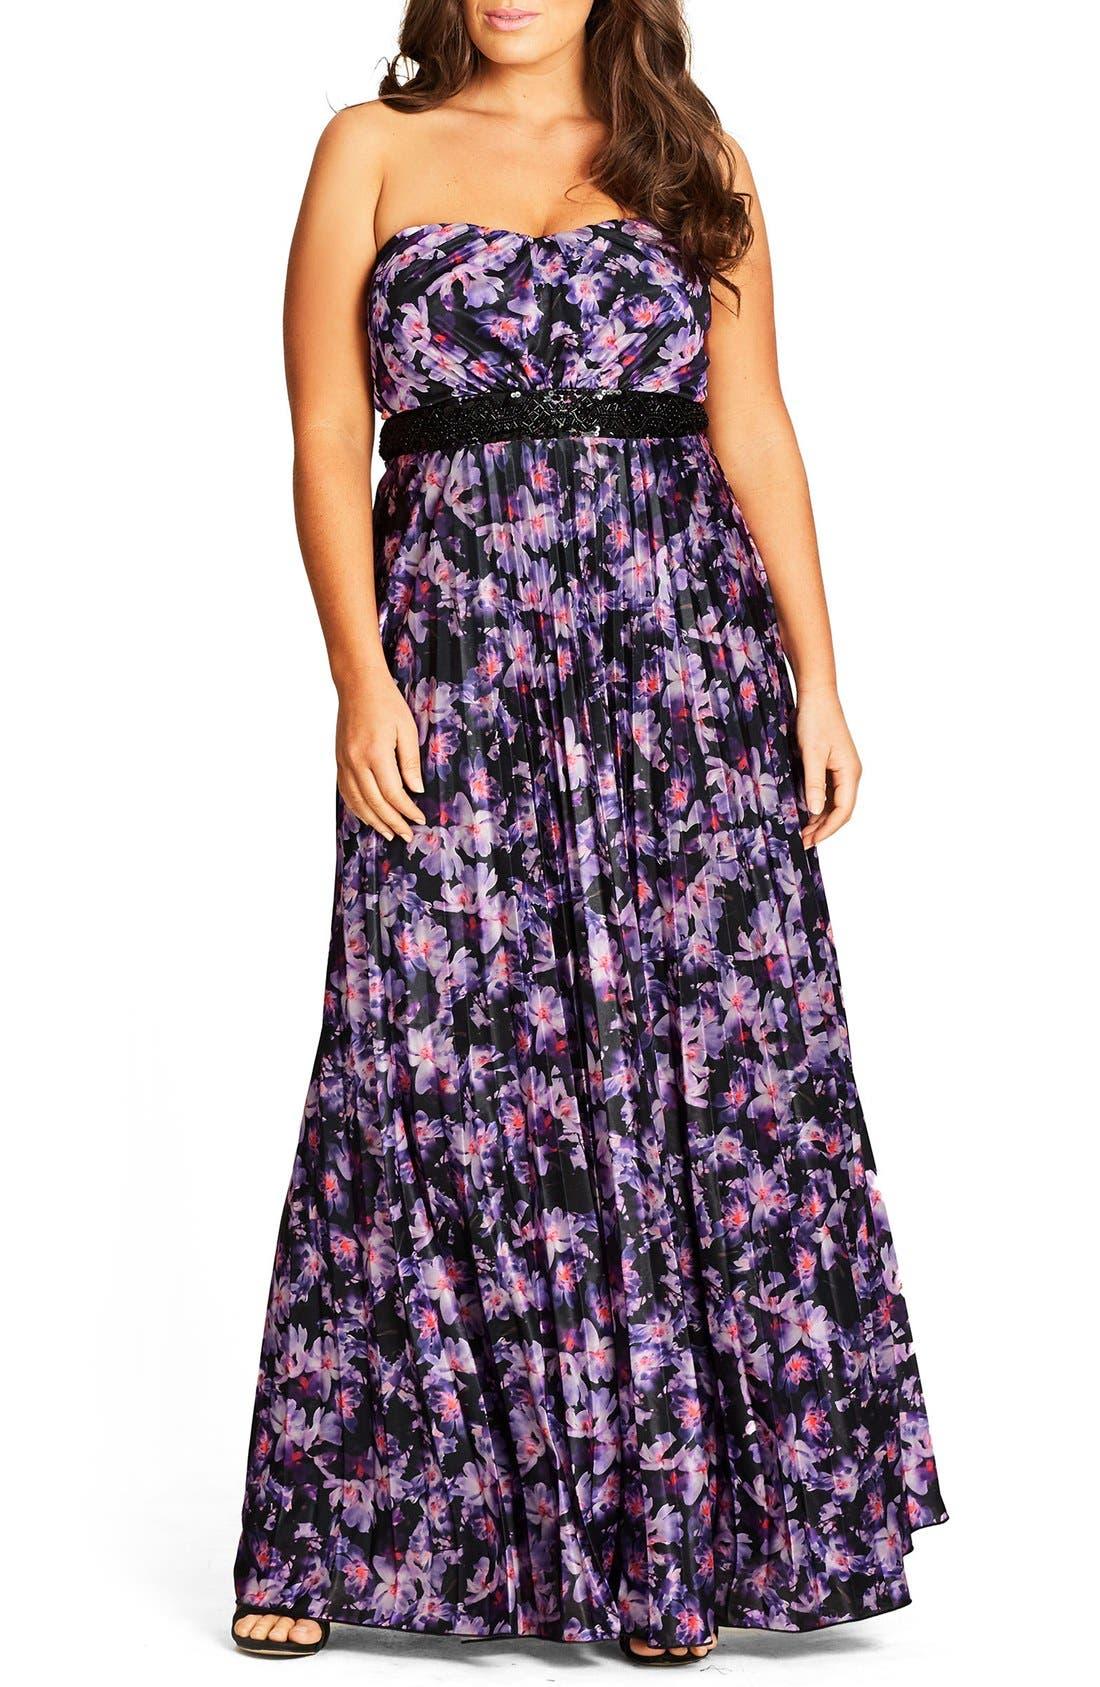 CITY CHIC Helena Print Strapless Maxi Dress